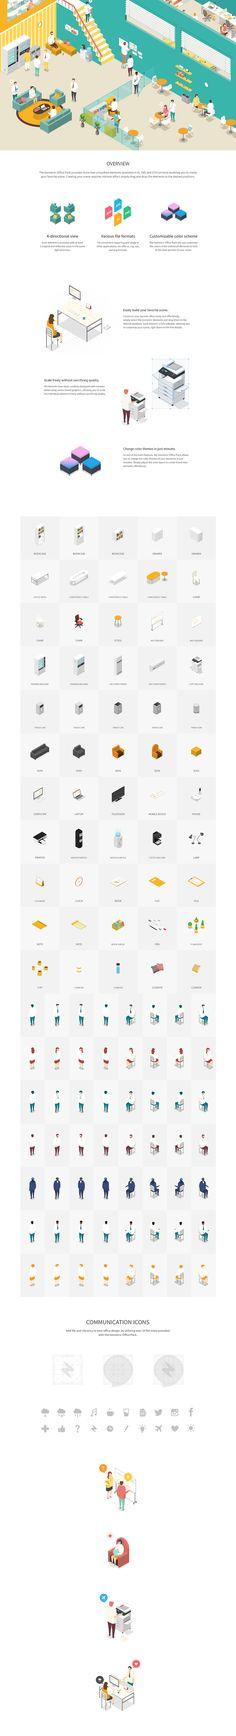 Isometric Office Pack on Behance